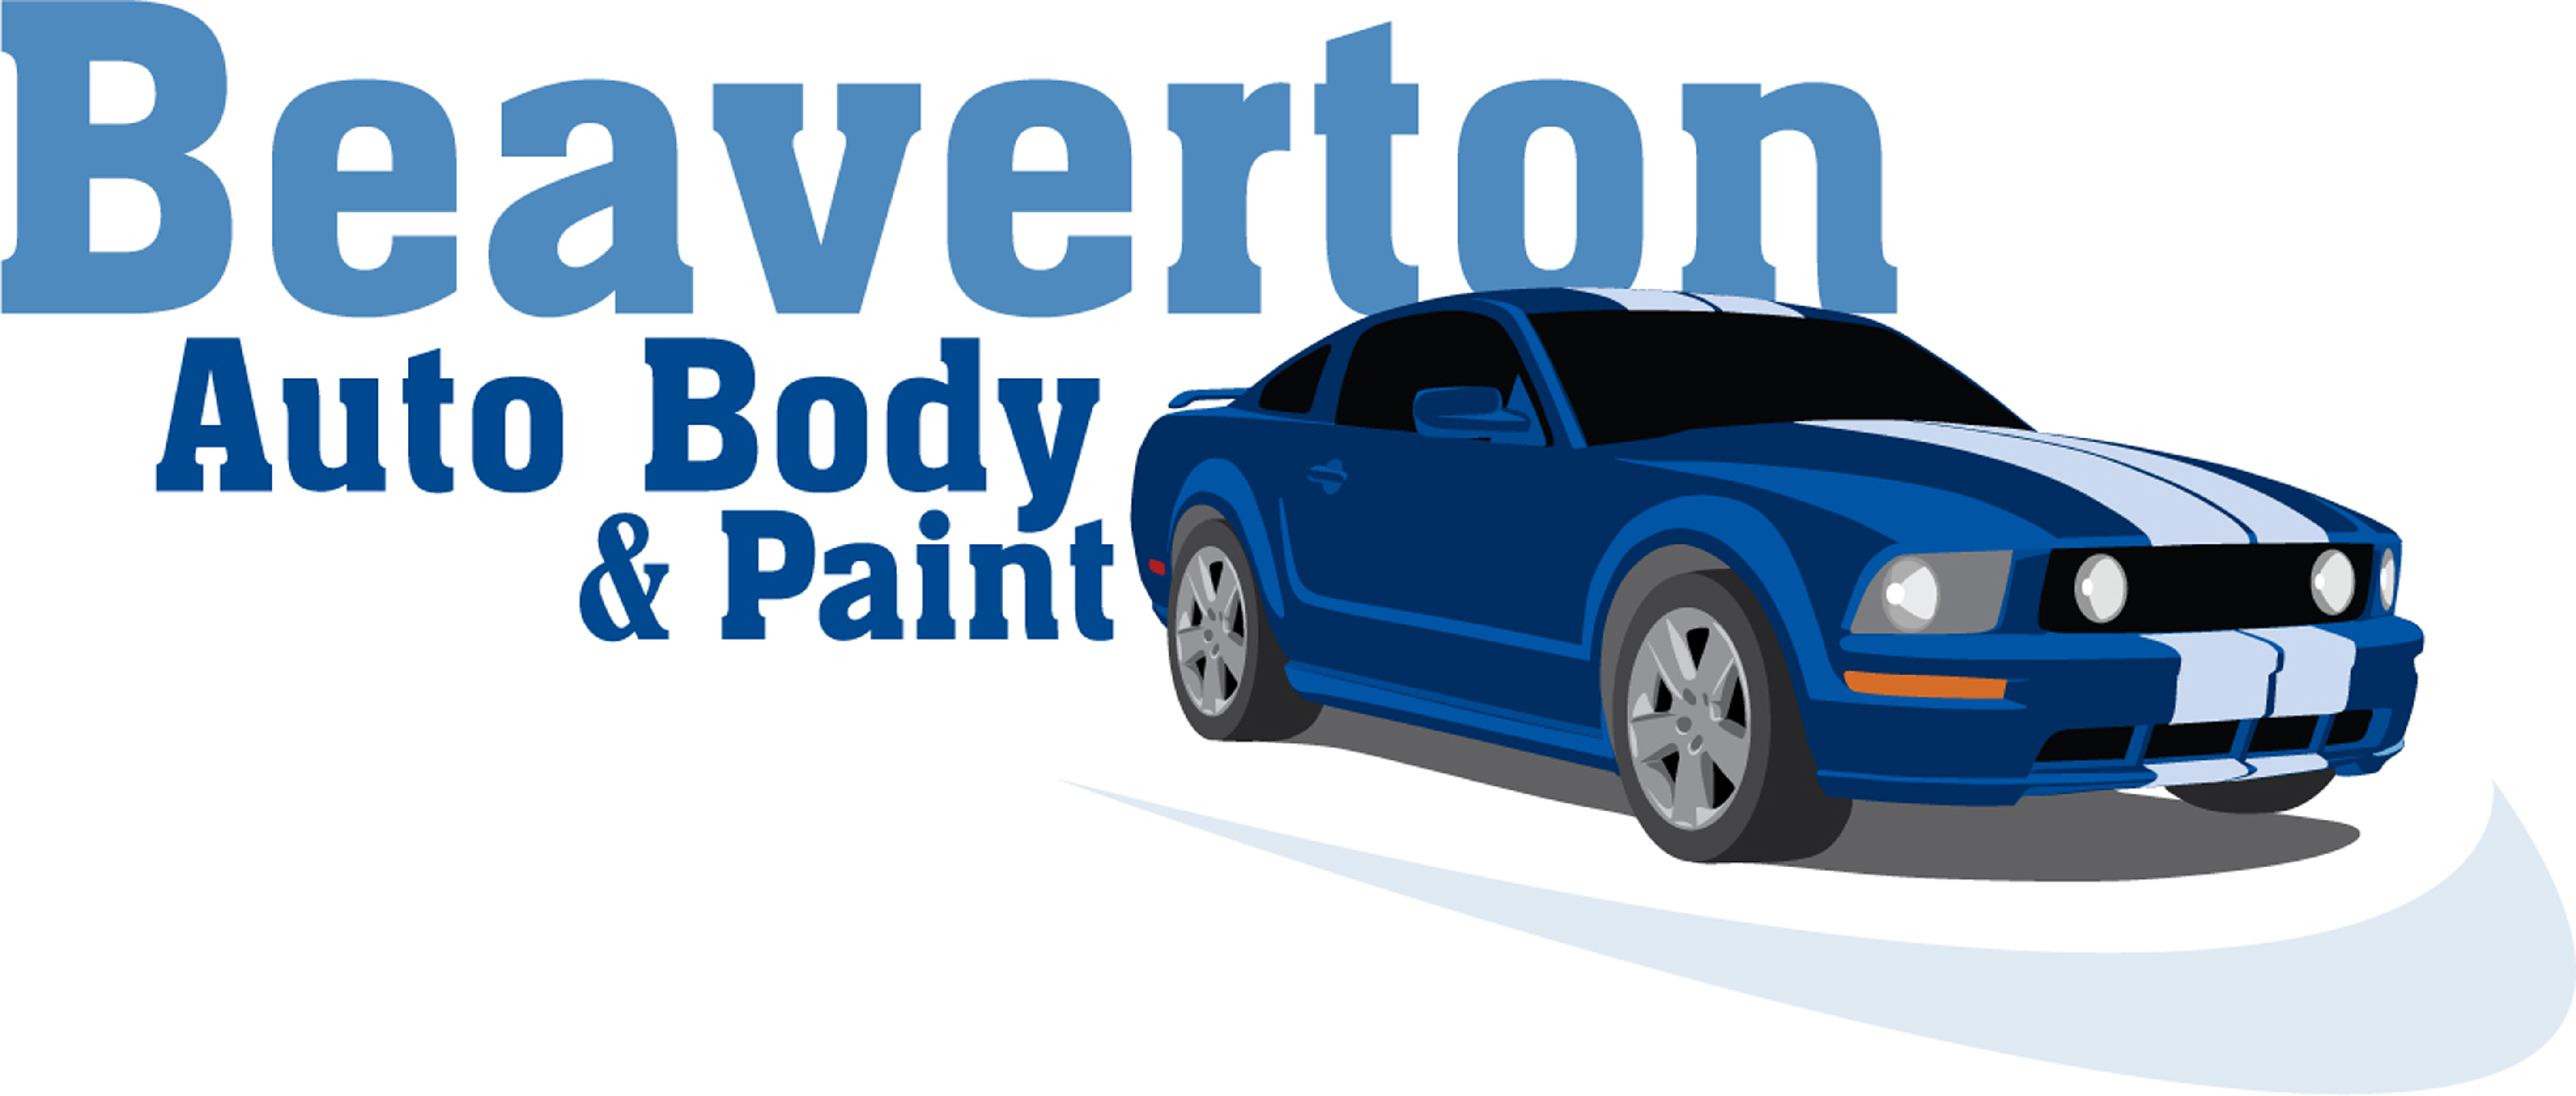 beaverton auto body paint 4330 sw 142nd ave beaverton